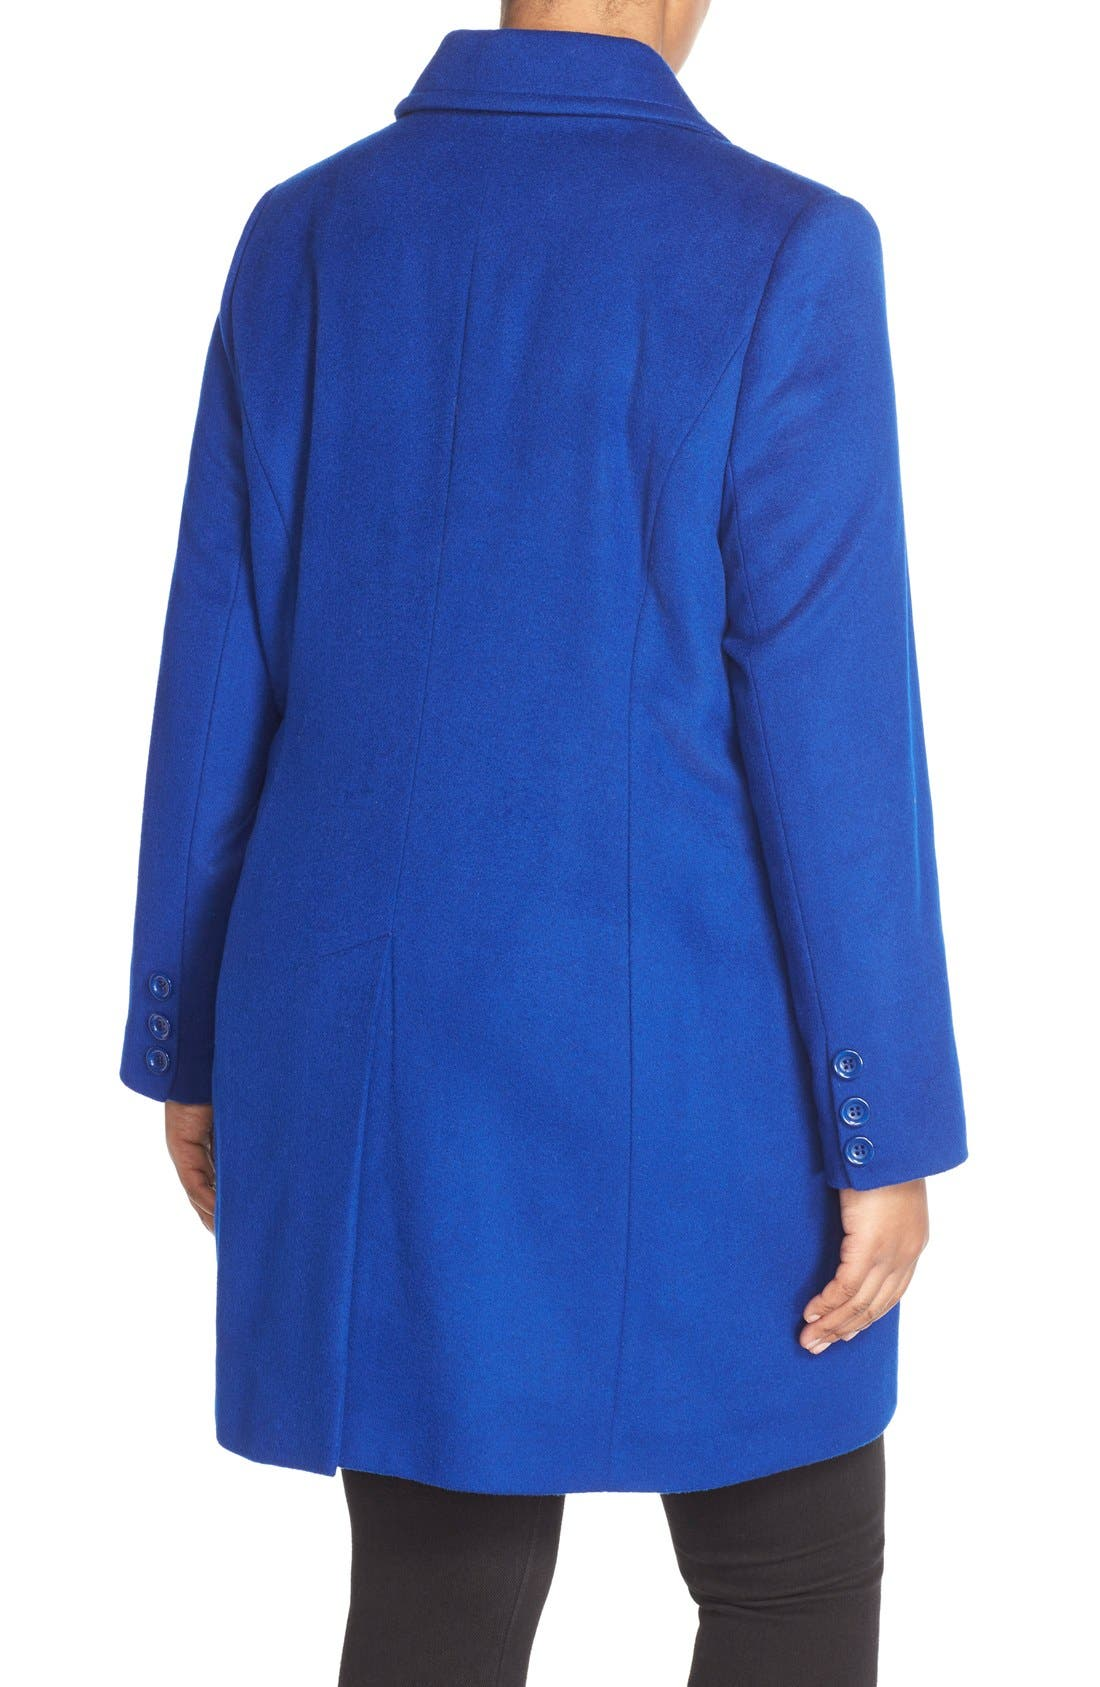 Notch Collar Wool Blend Coat,                             Alternate thumbnail 4, color,                             COBALT